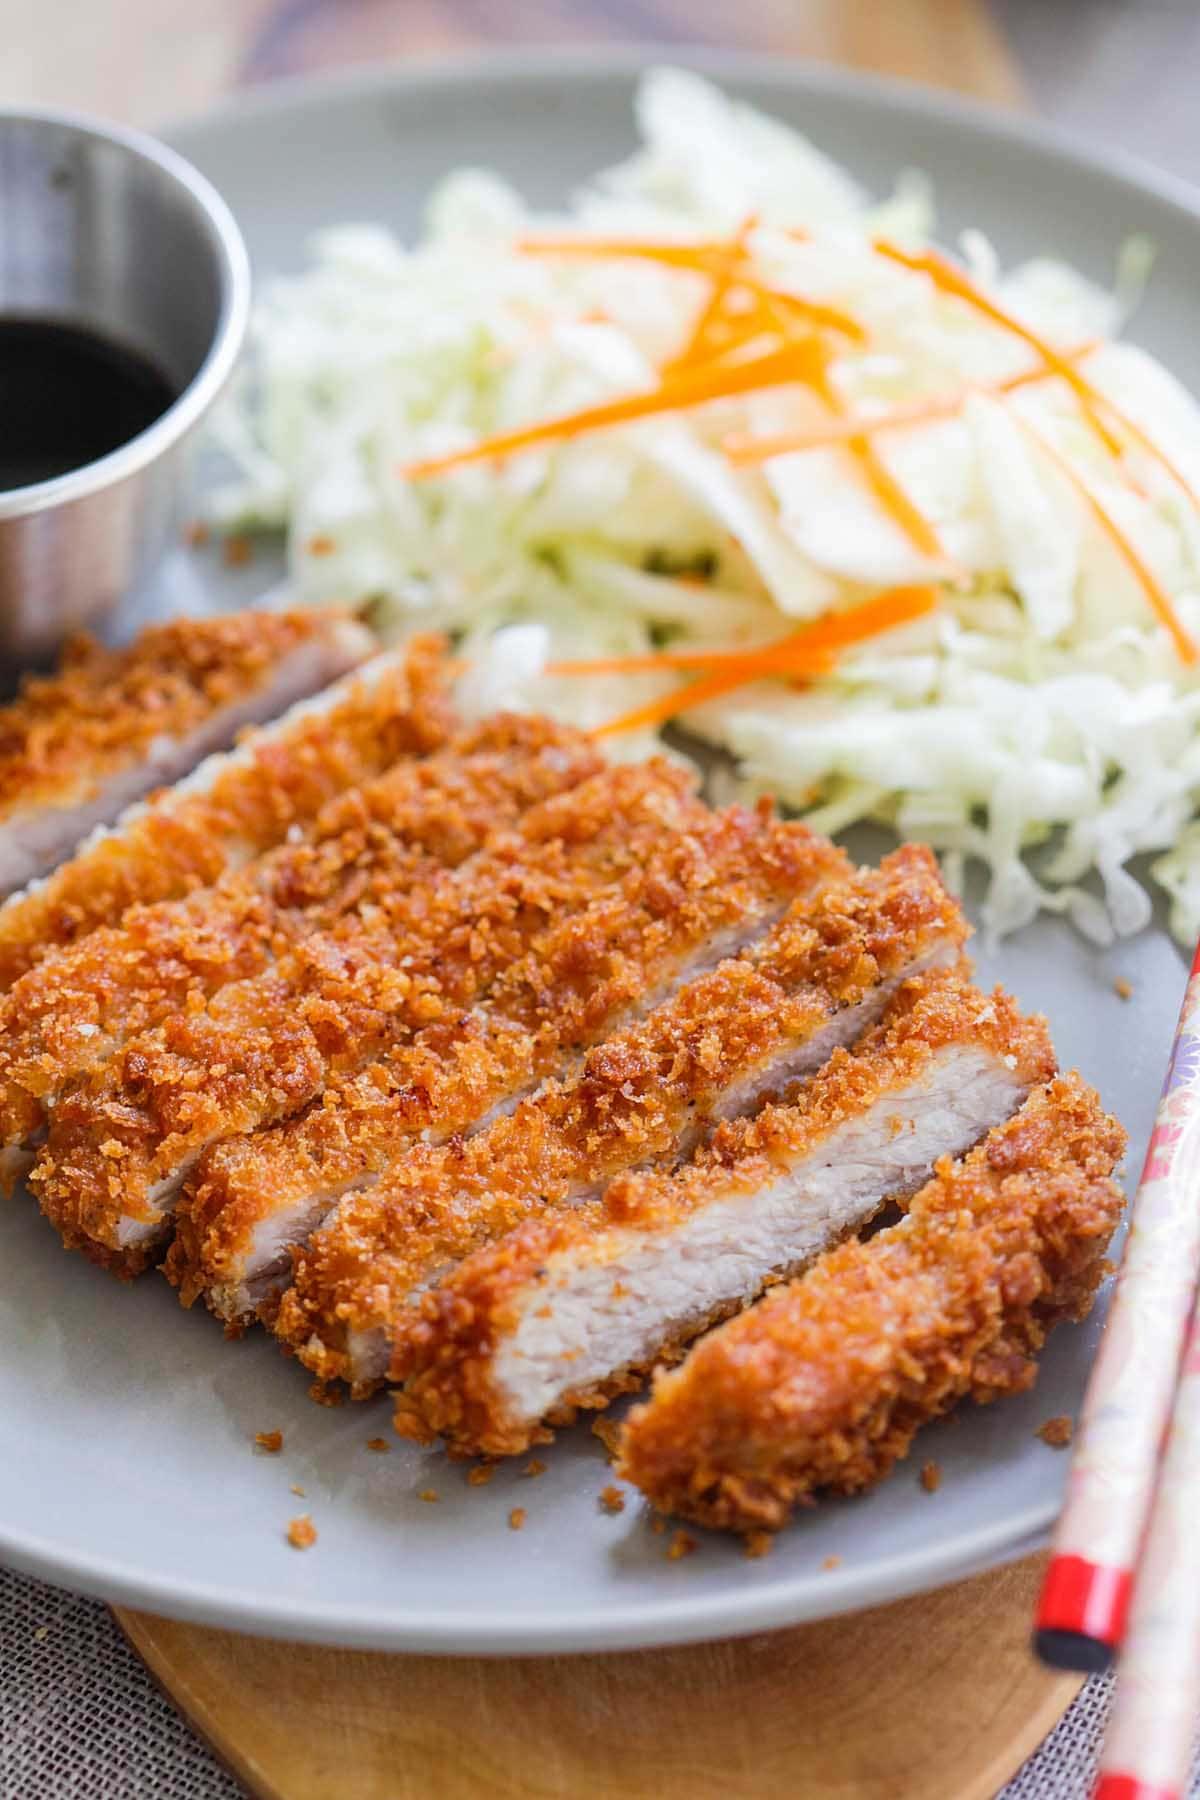 Japanese konkatsu chicken recipe.